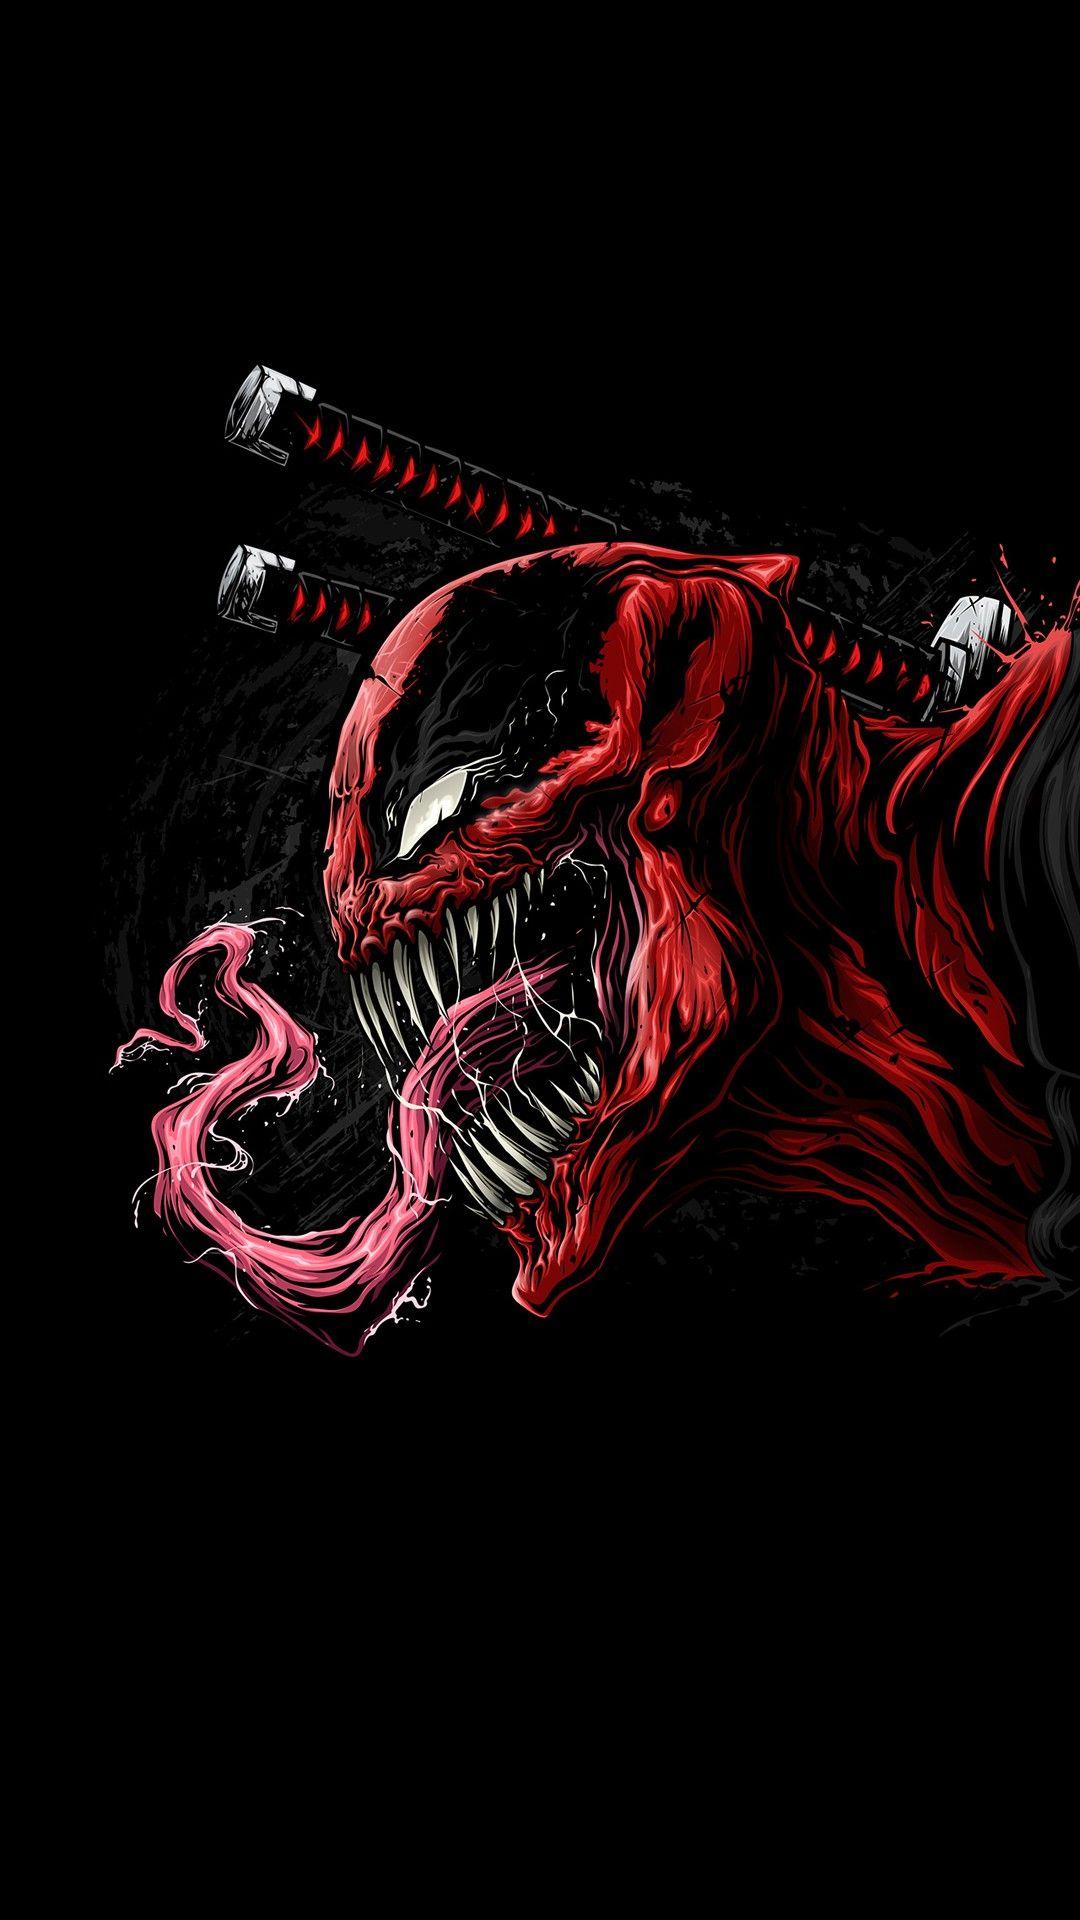 Deadpool Amoled Wallpaper H Pinterest Marvel Comic And Comics